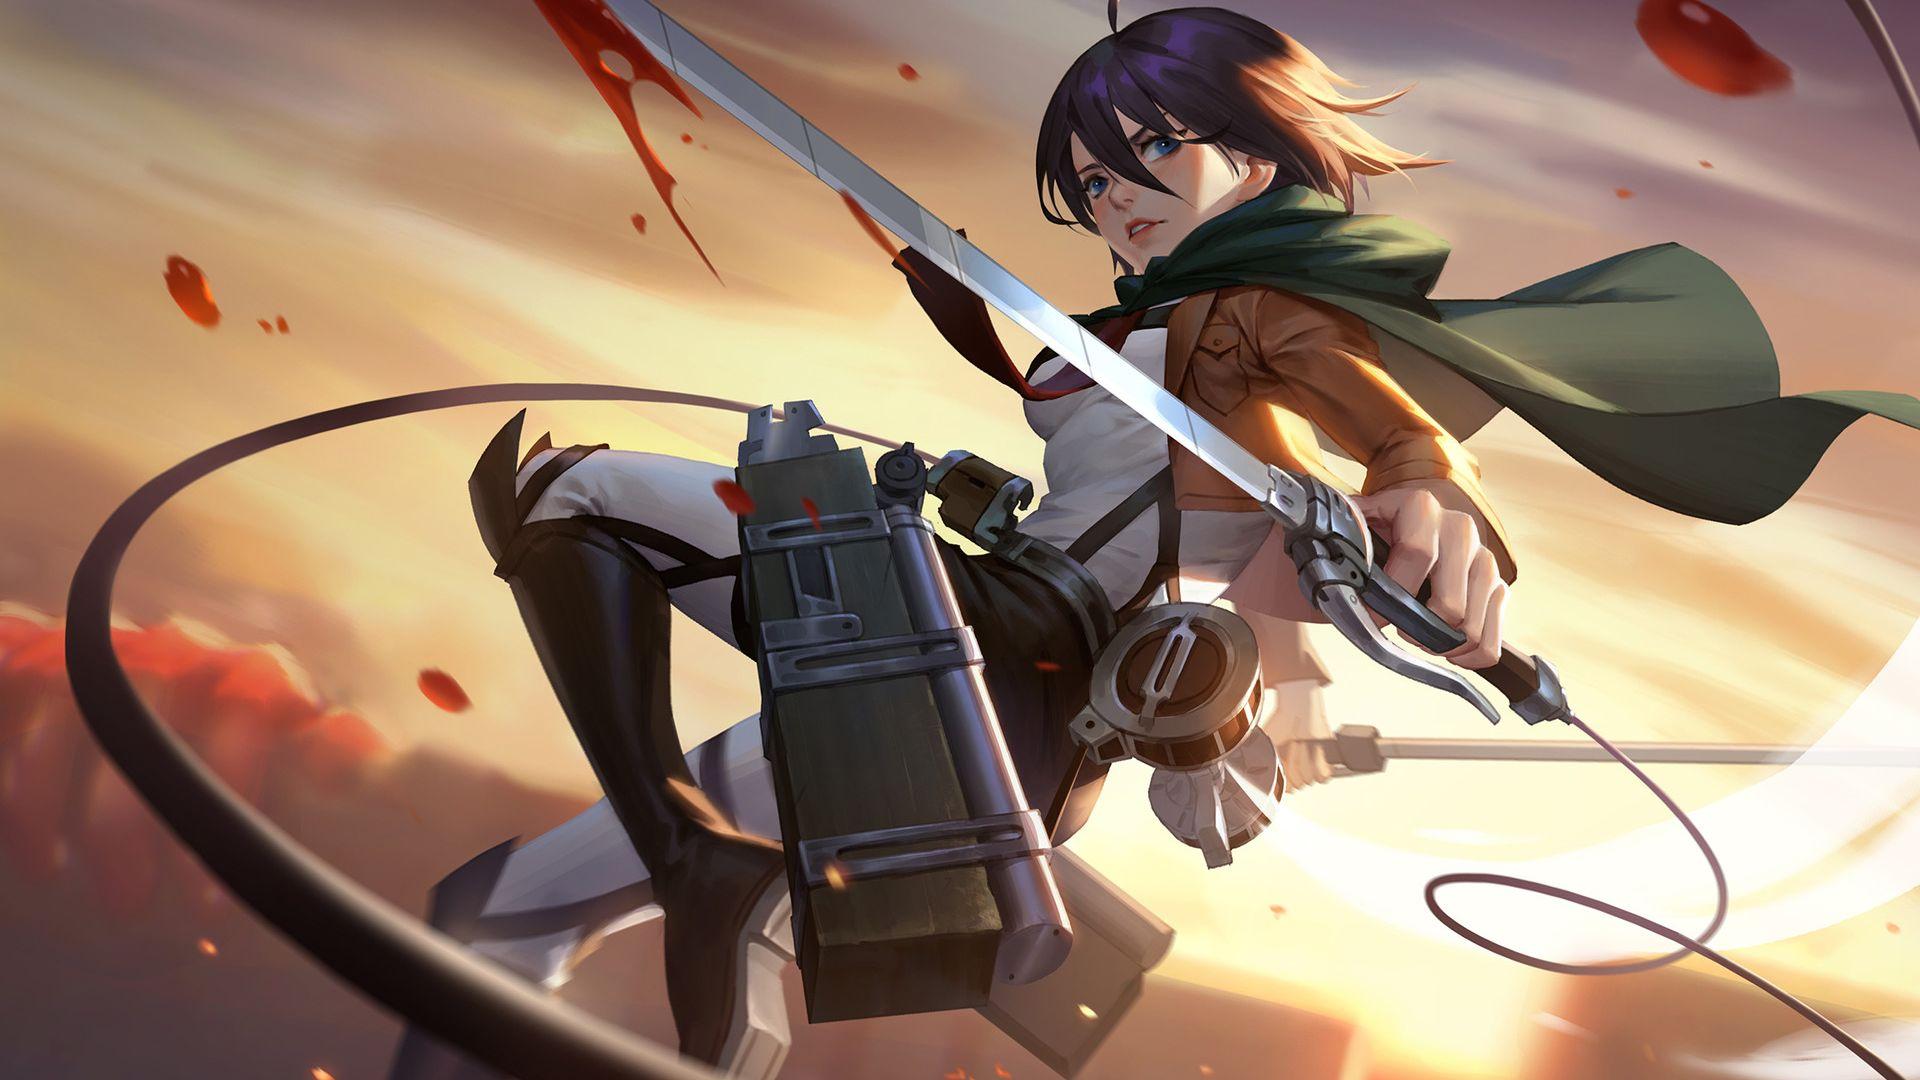 Wallpaper Mikasa Ackerman, Attack on Titan, art, anime girl